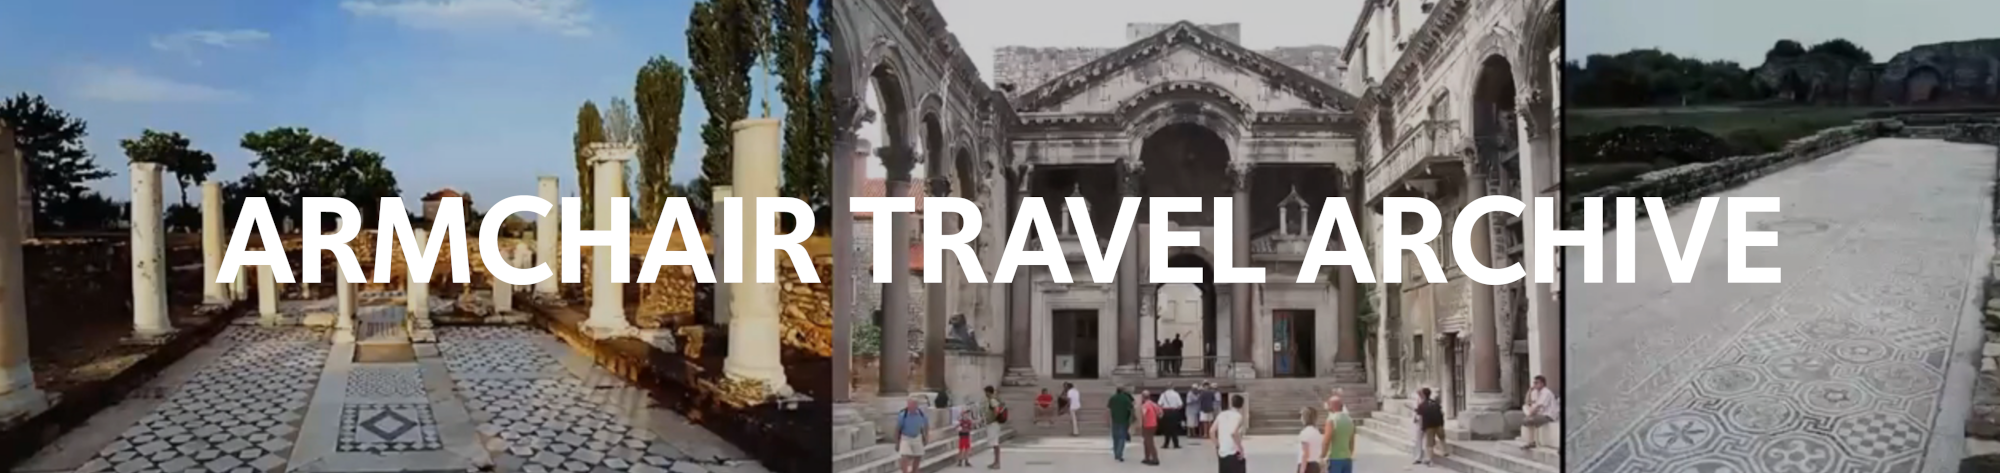 Armchair travel archive header